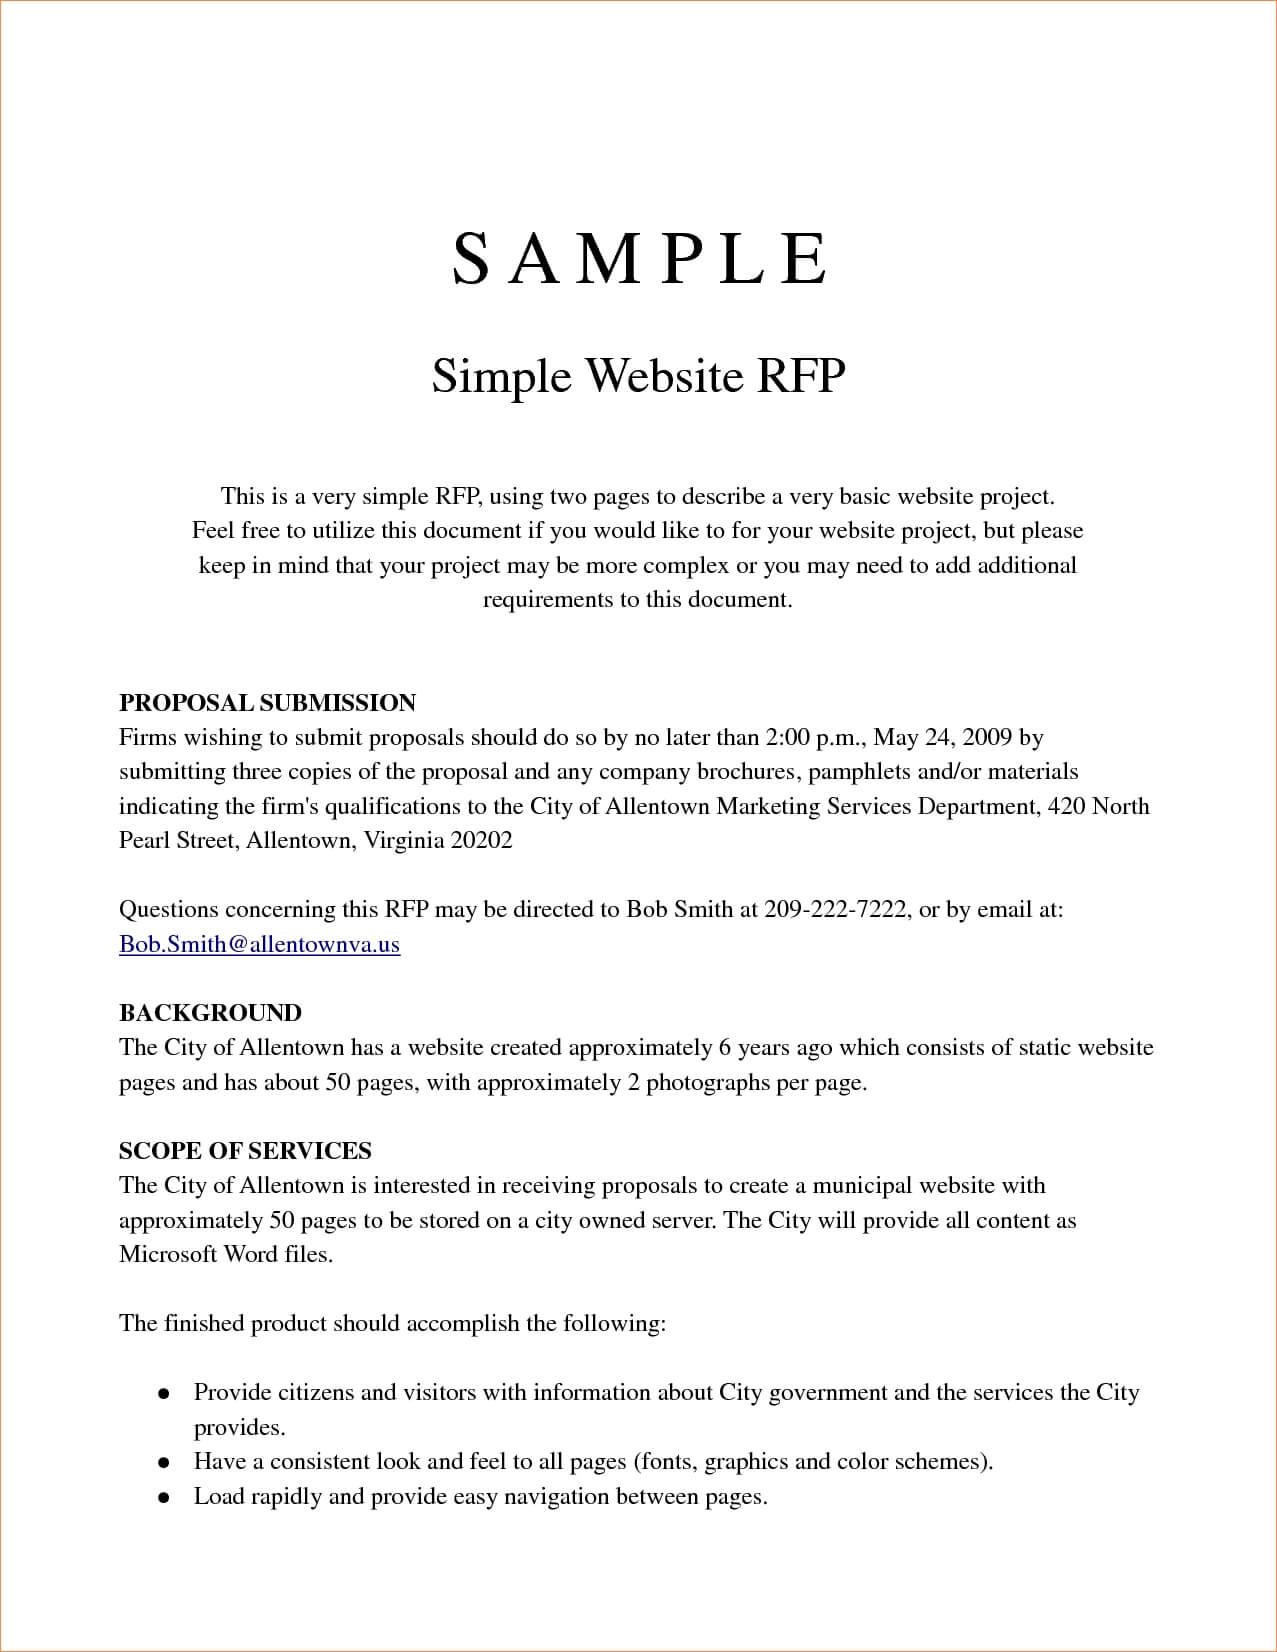 SEM RFP Example